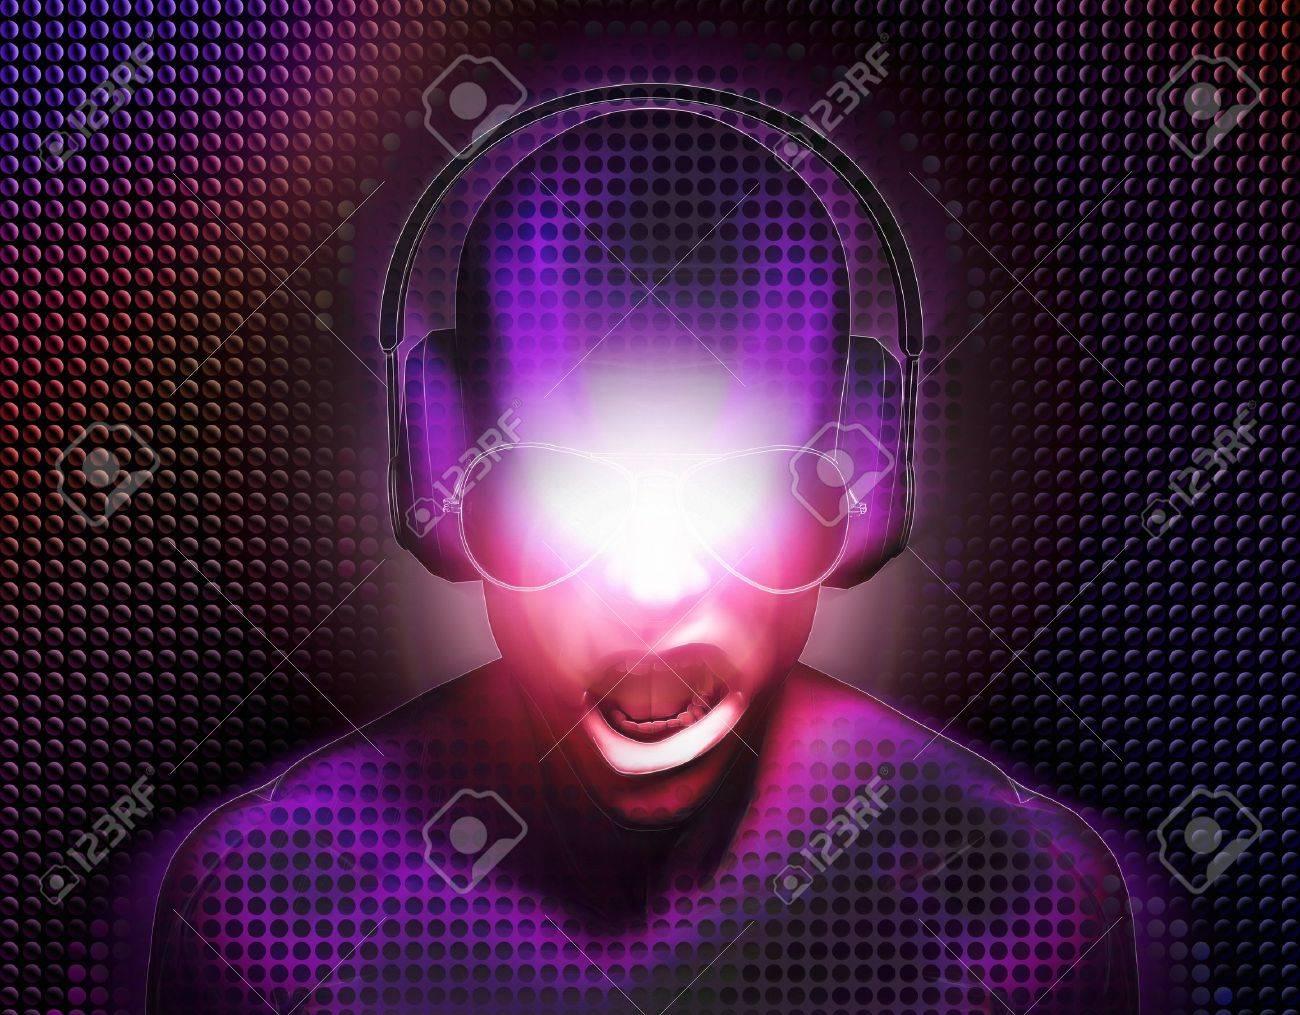 DJ With Headphones